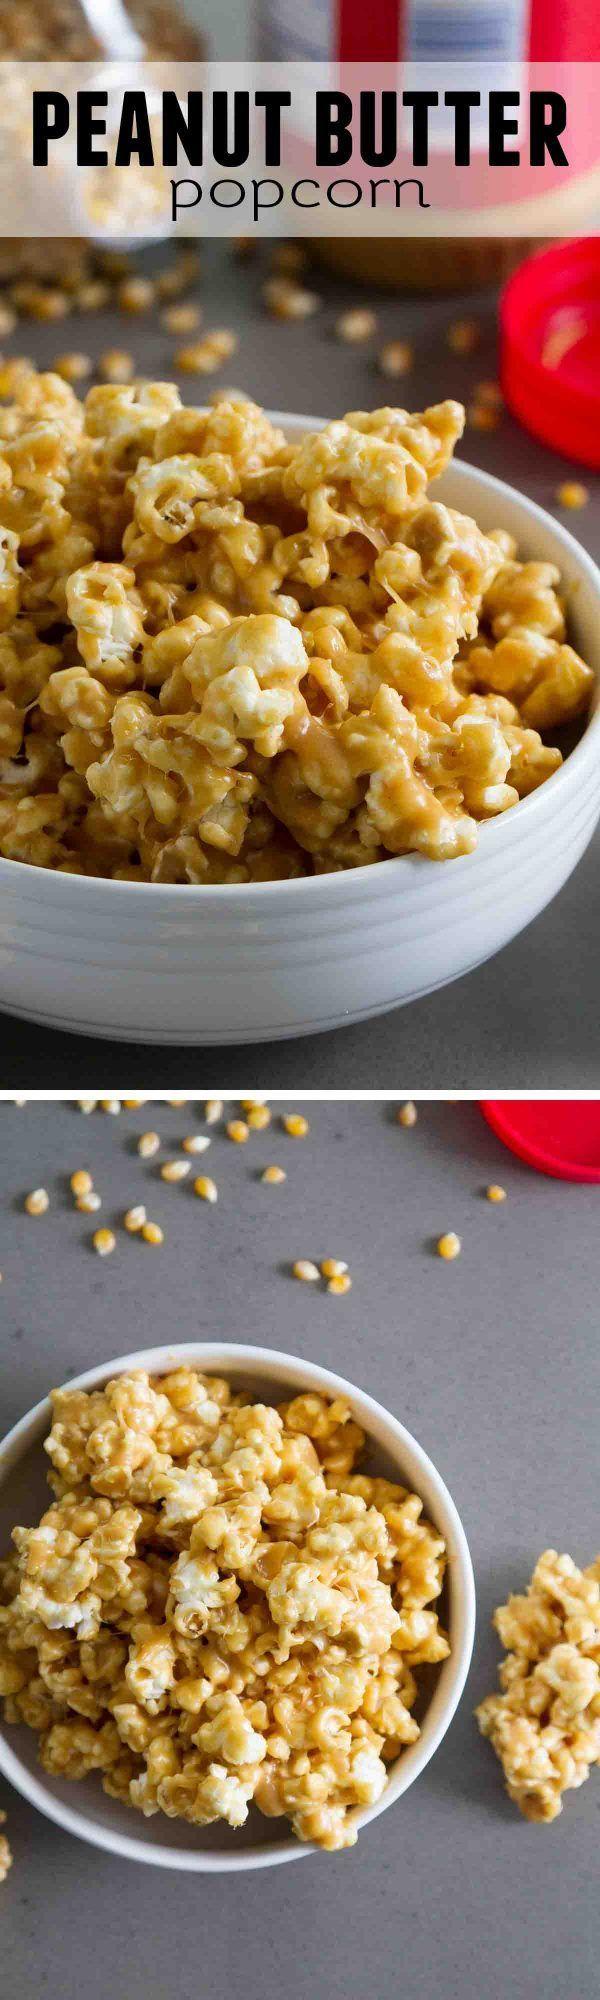 Peanut Butter Popcorn - Taste and Tell